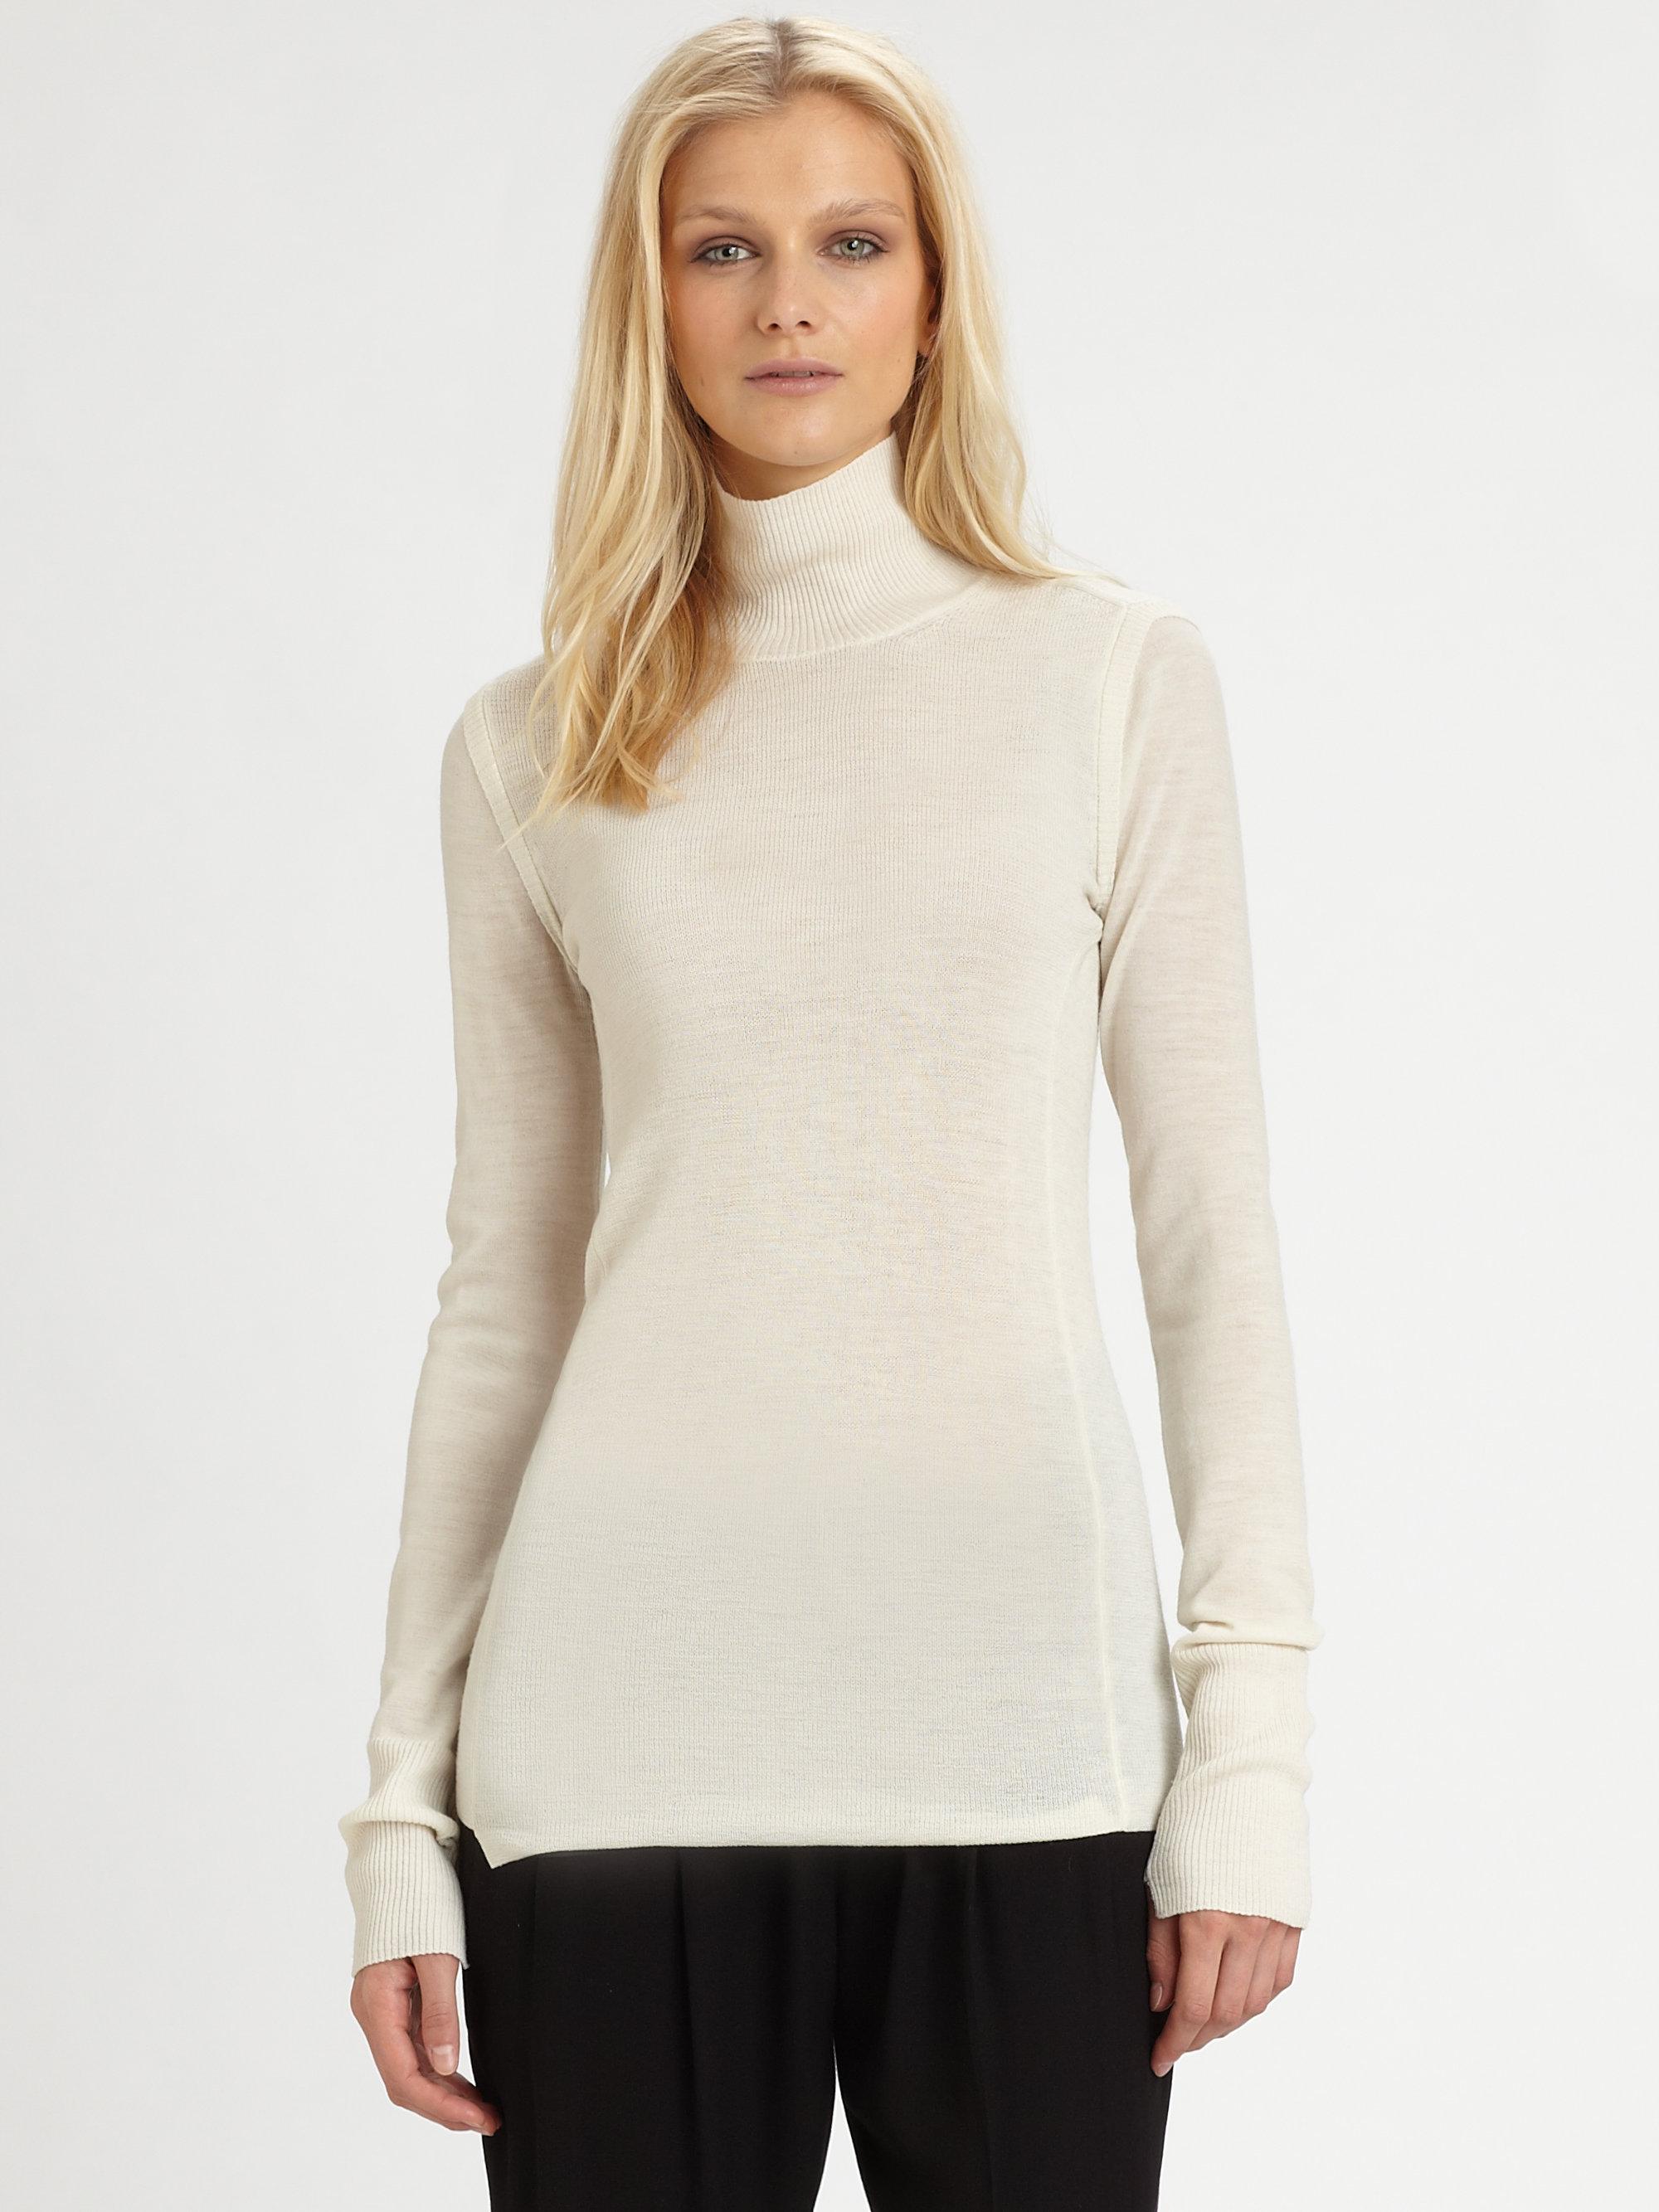 Alc Sweater